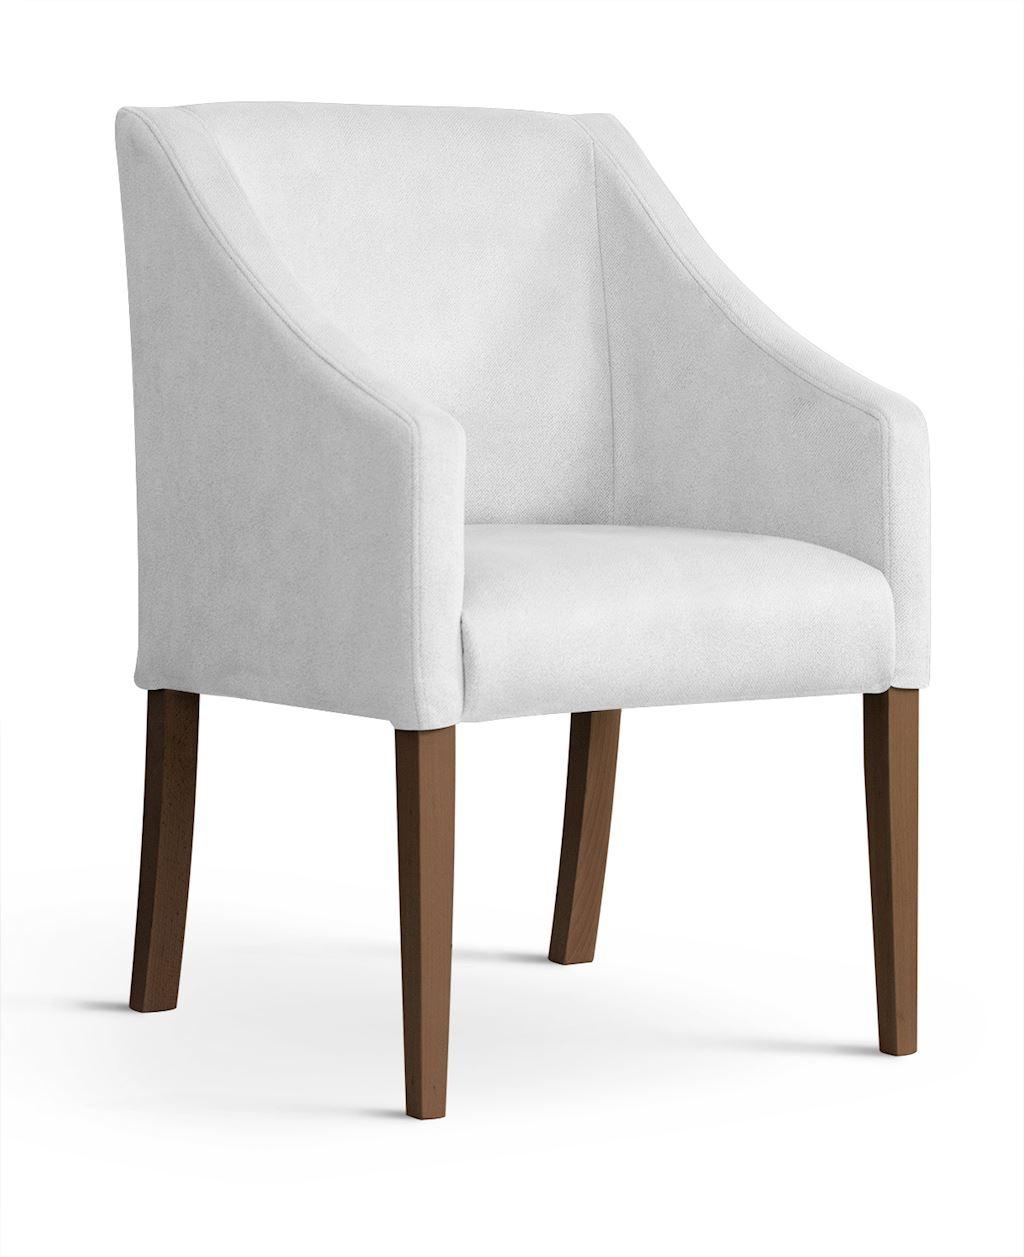 Fotoliu fix tapitat cu stofa, cu picioare din lemn Capri Silver / Walnut, l58xA60xH89 cm imagine